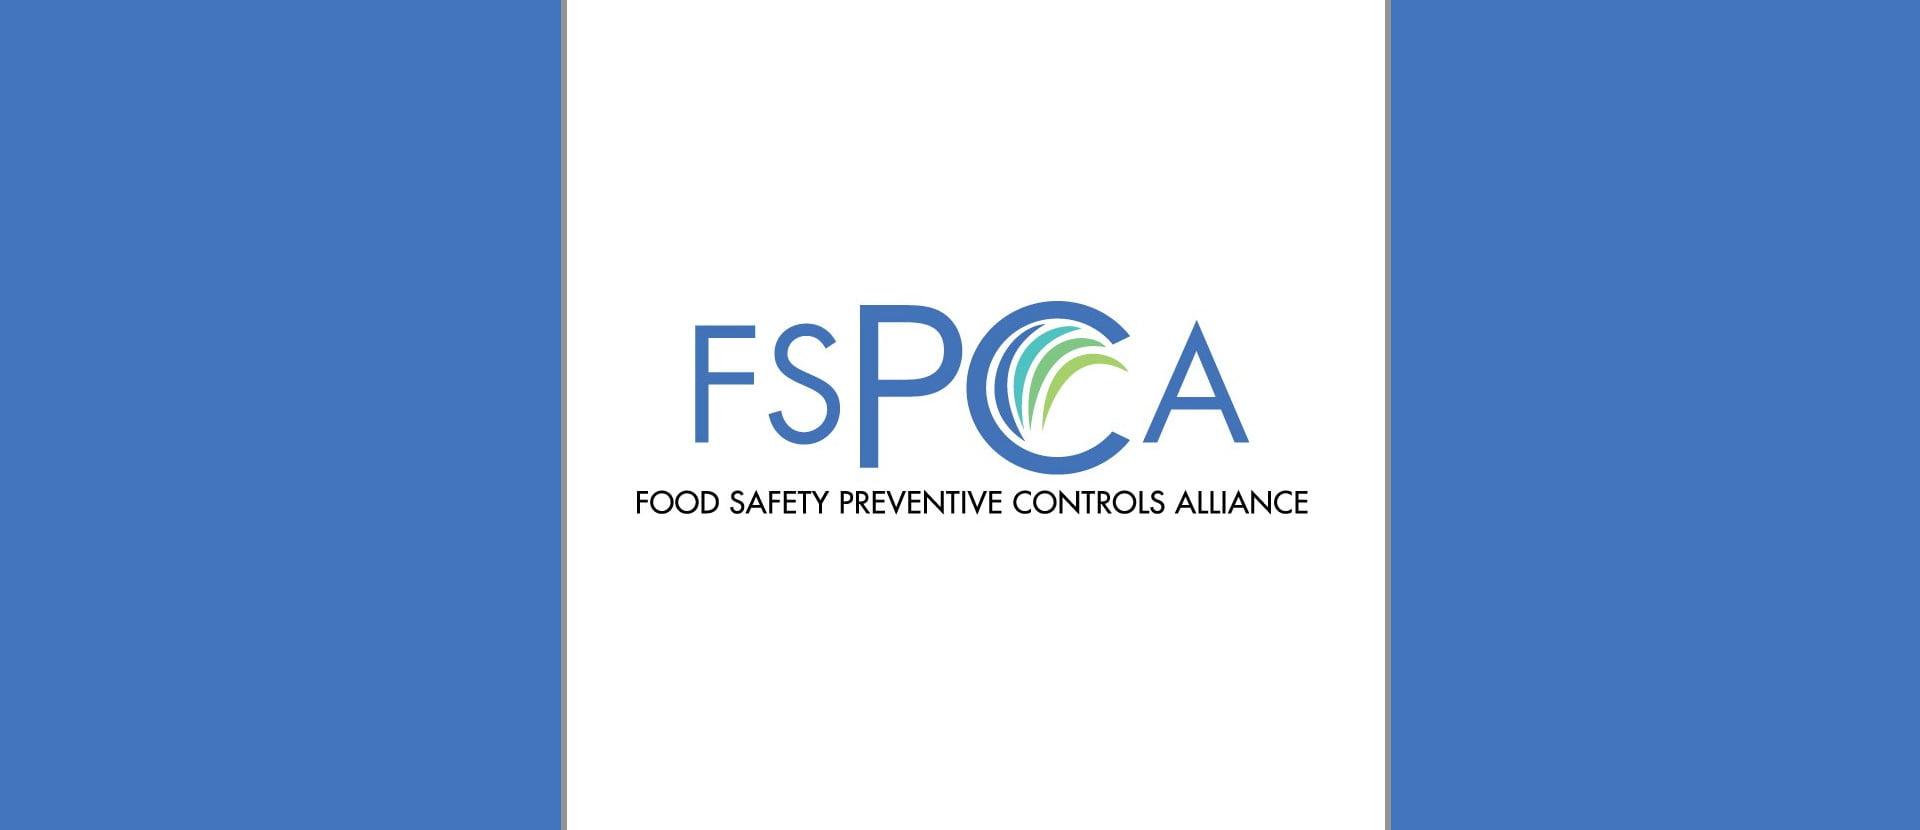 Food Safety Preventive Controls Alliance (FSPCA)